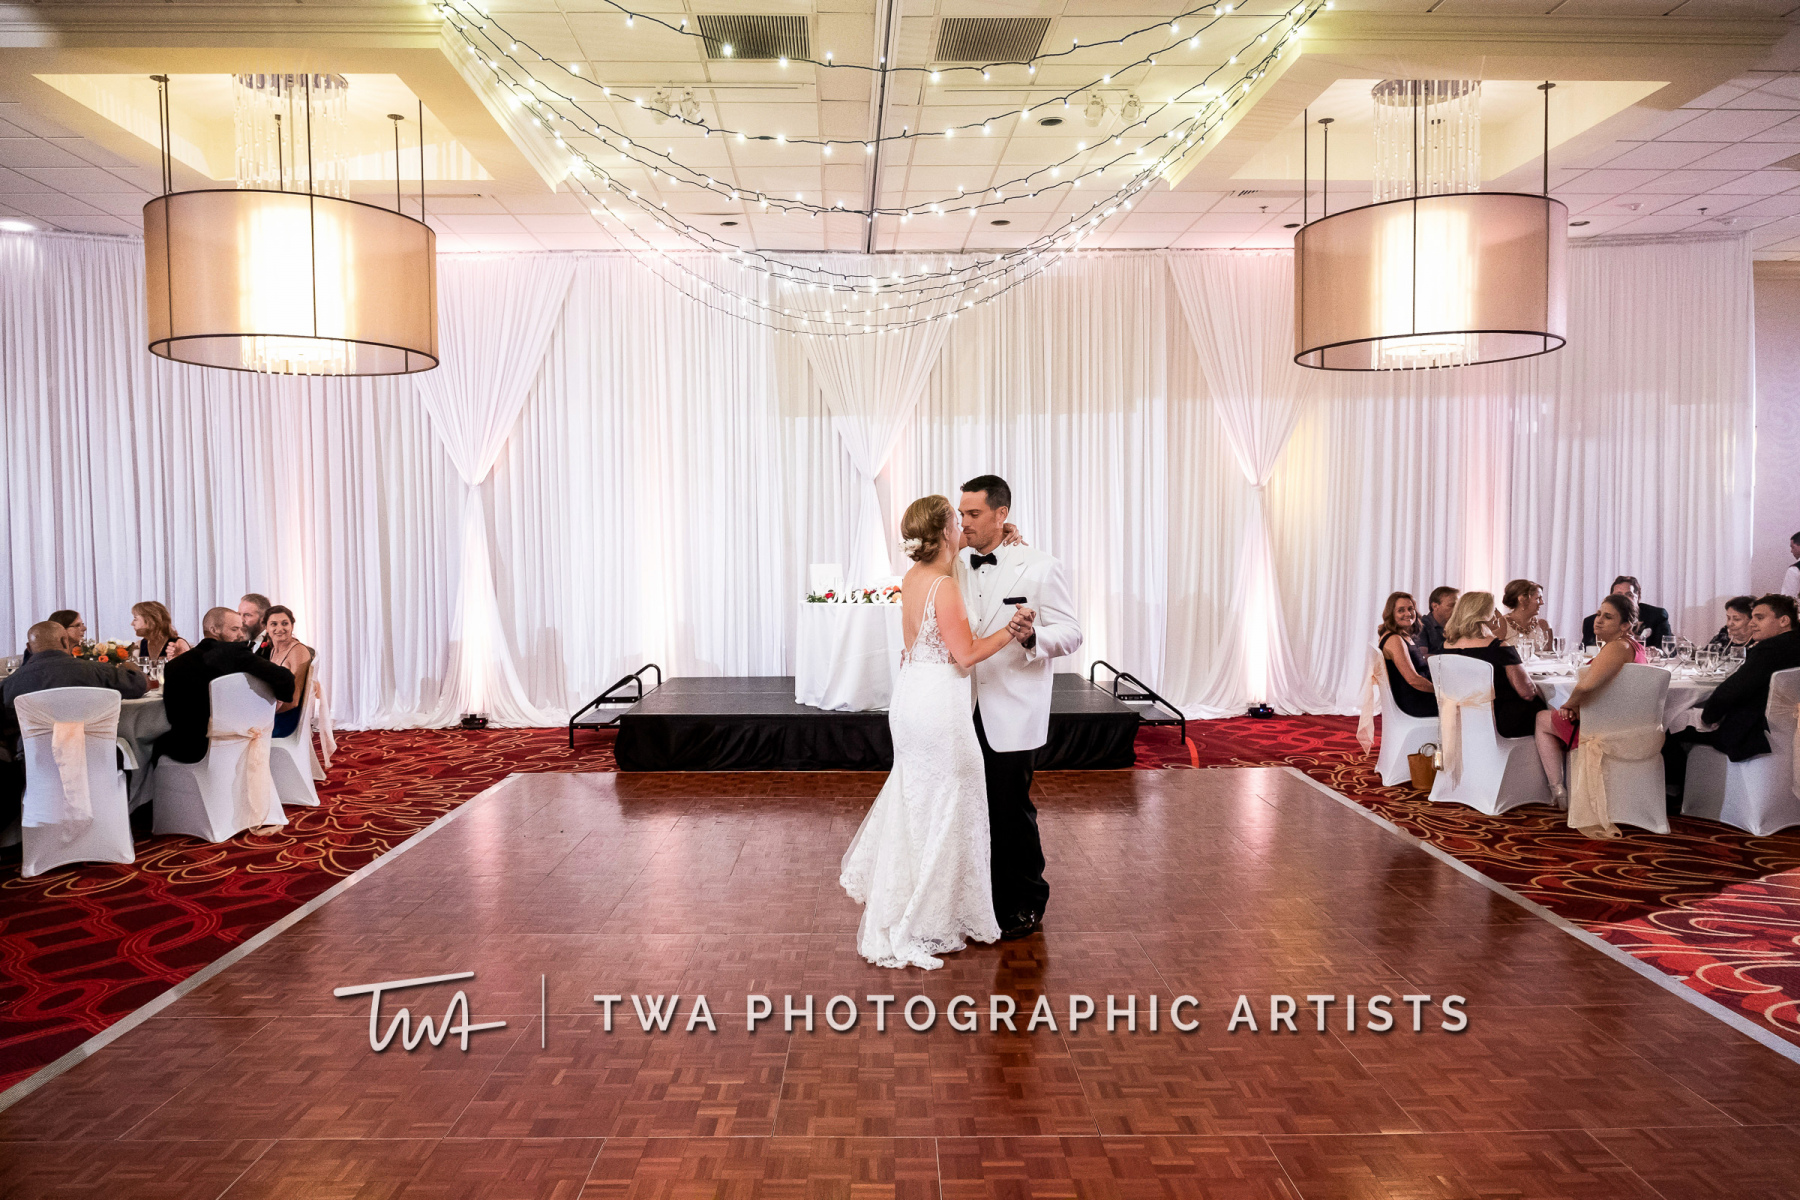 Chicago-Wedding-Photographers-Renaissance-Hotel_Hohensee_Fleishman_JG_DK-080-0585